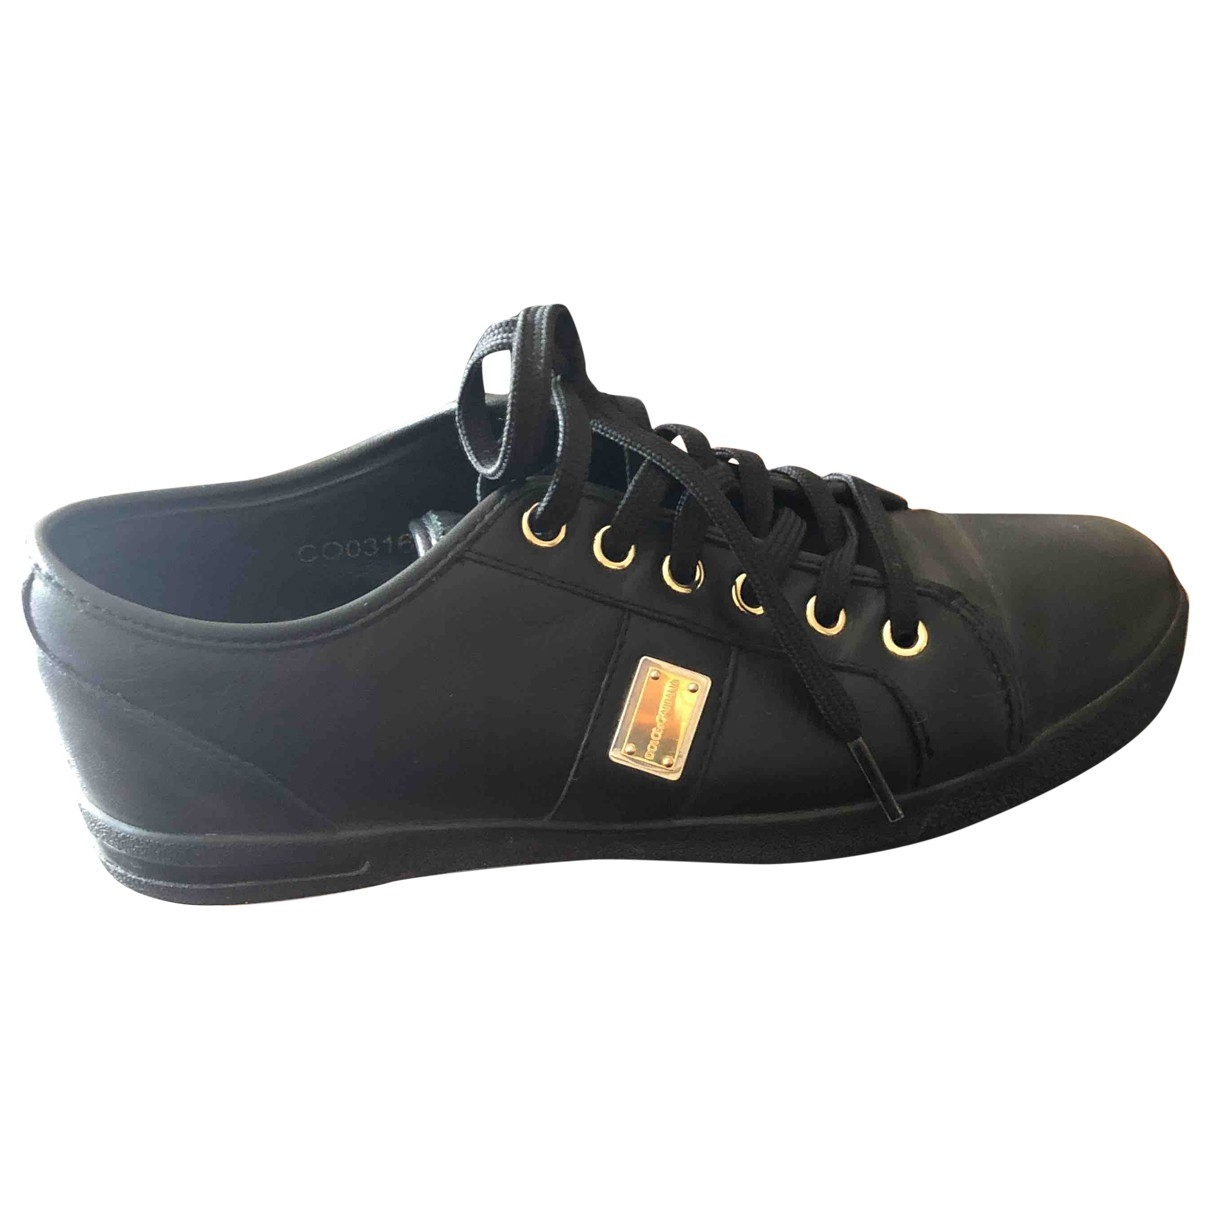 Dolce & Gabbana \N Black Leather Trainers for Women 36 EU